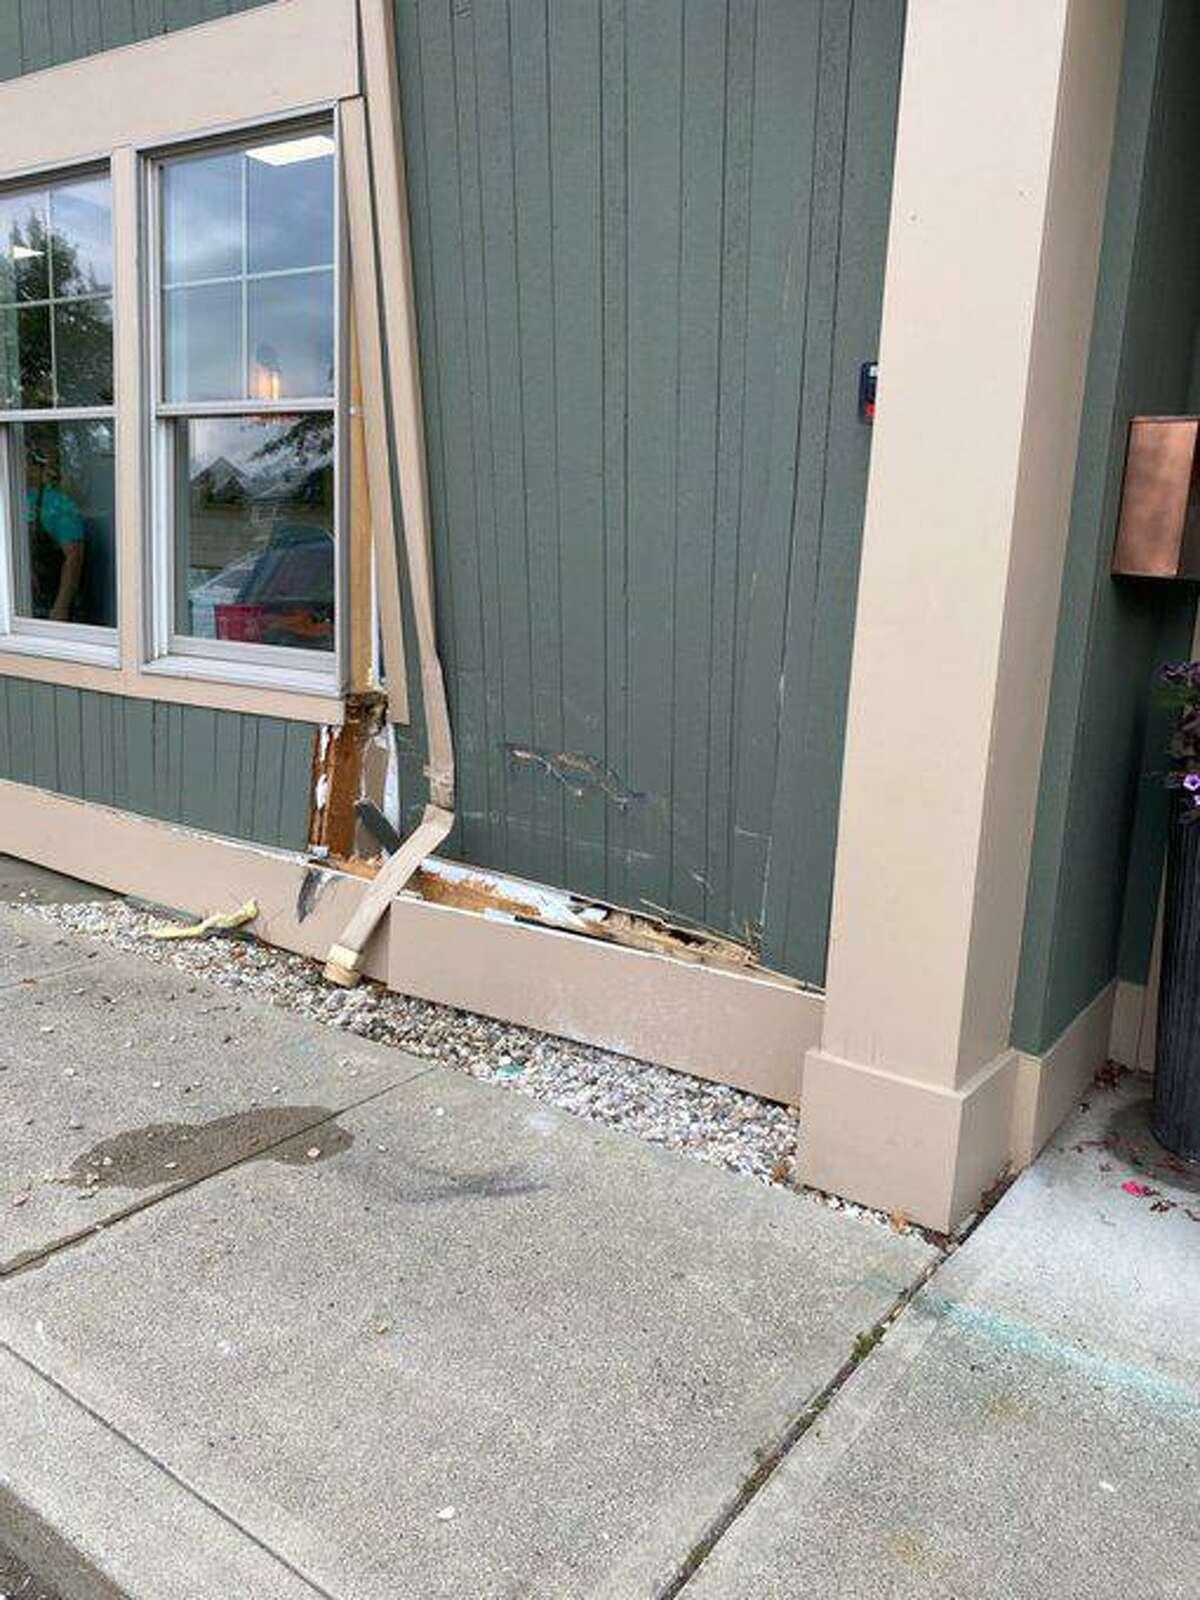 Southbury Seafood Market storefront damaged by car crash